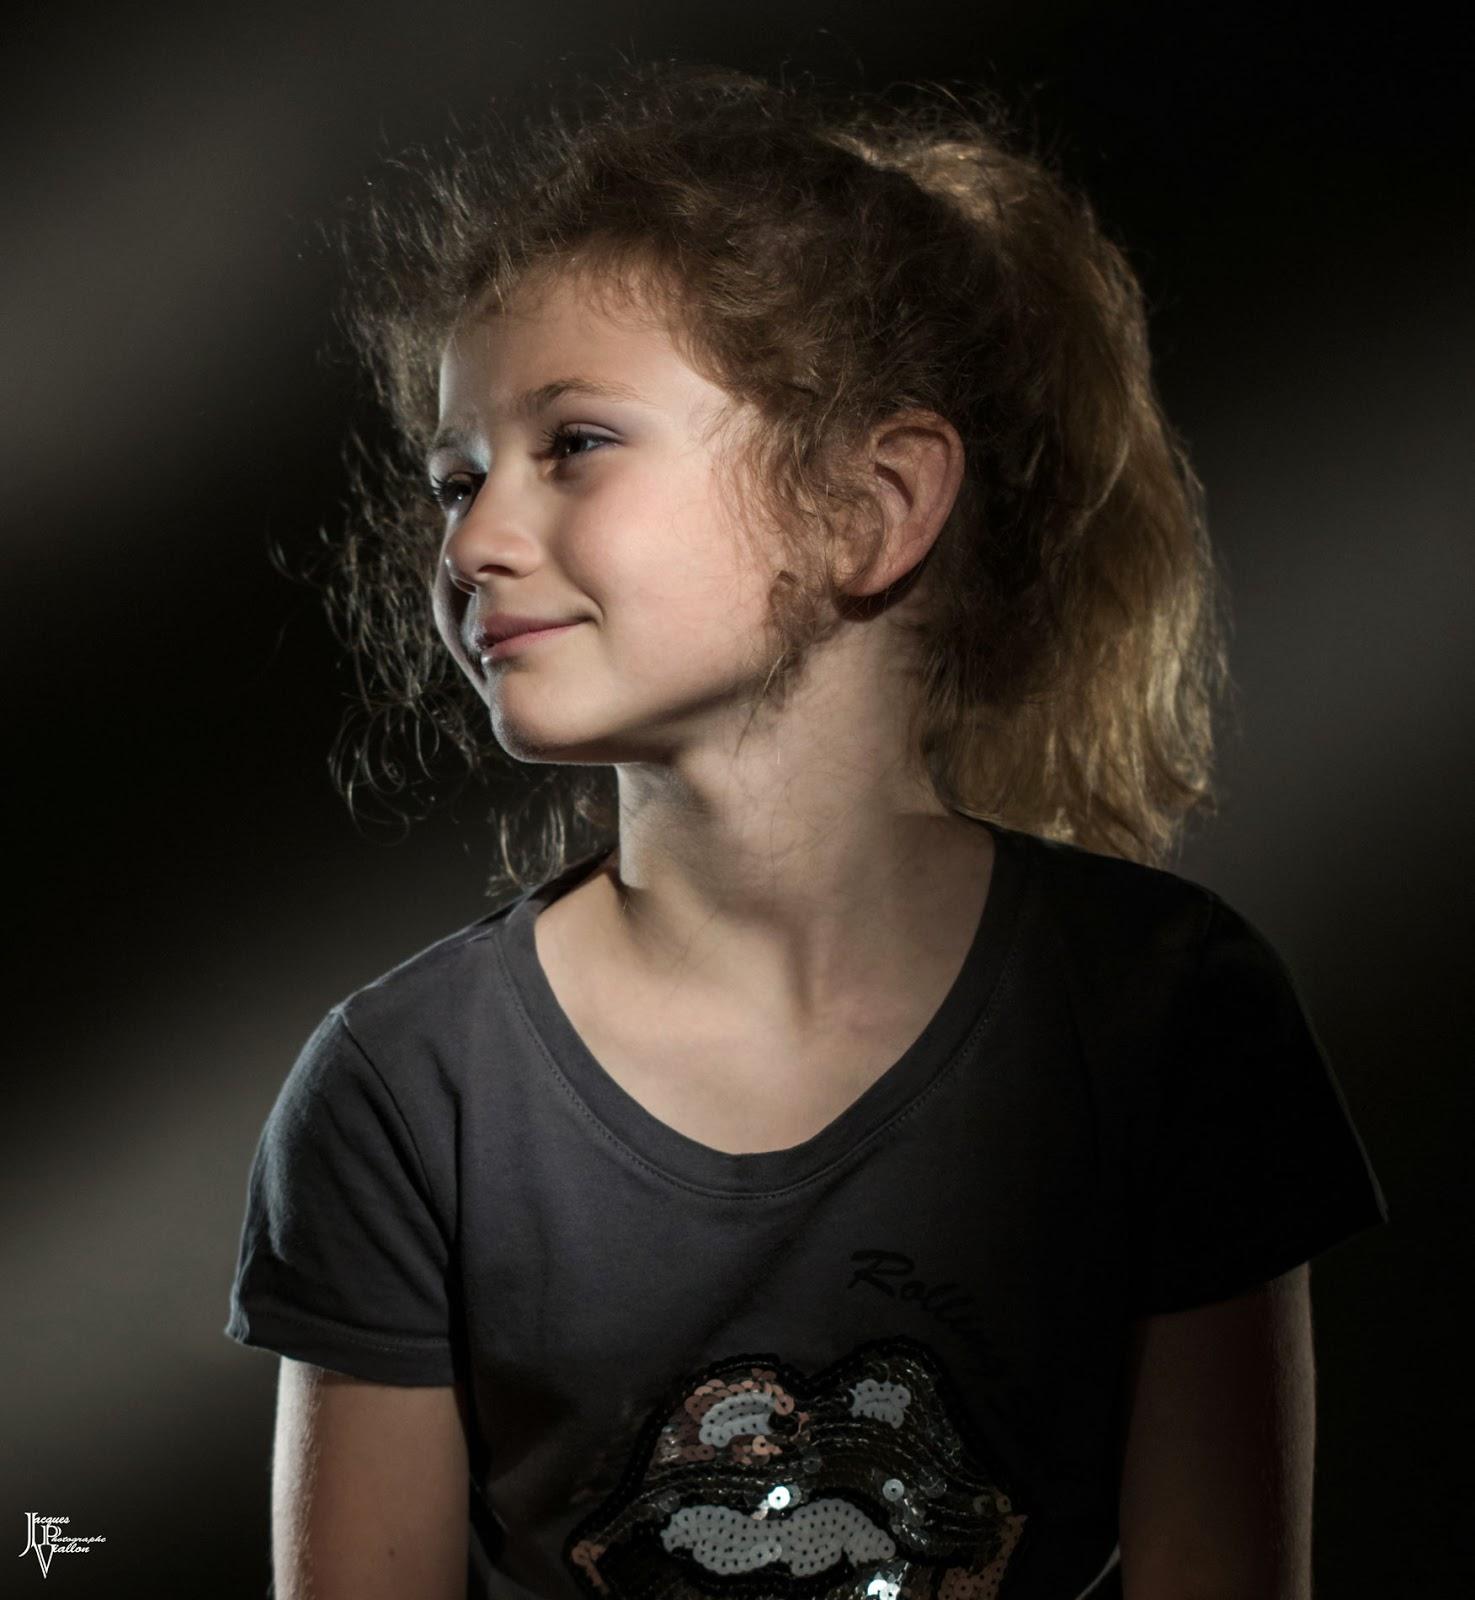 jacques viallon photographe tarifs portraits hollywoodiens enfants. Black Bedroom Furniture Sets. Home Design Ideas